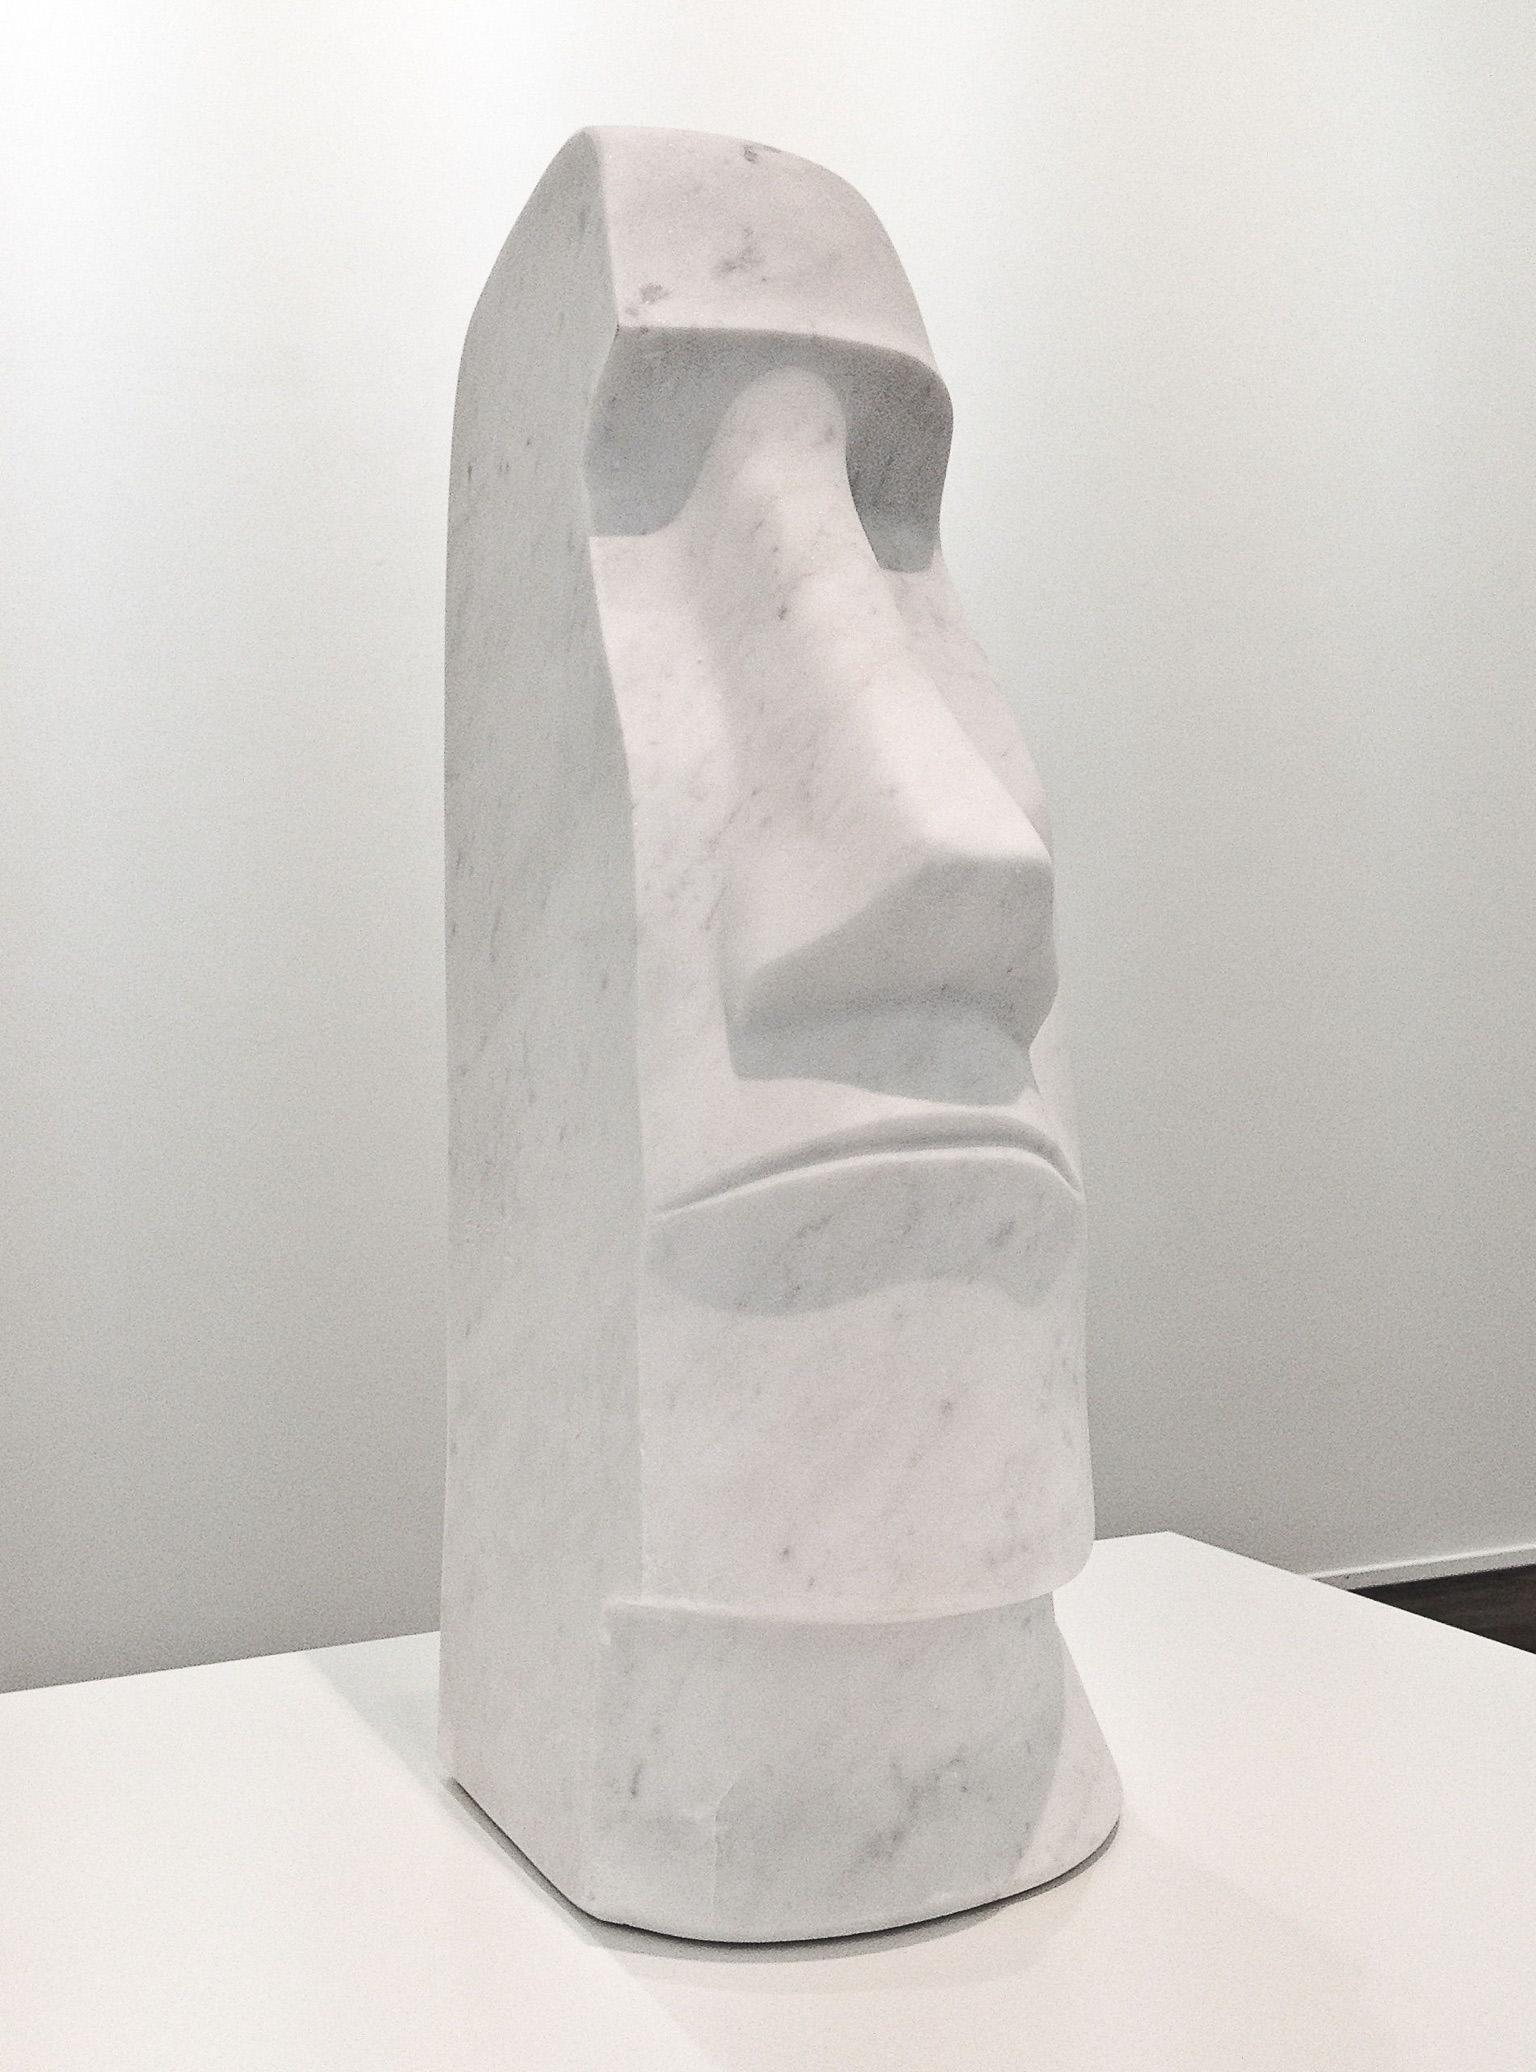 Emoji, 2015 marmo statuario  60x30 cm Moai primitivismo scultura statuaria emoticon